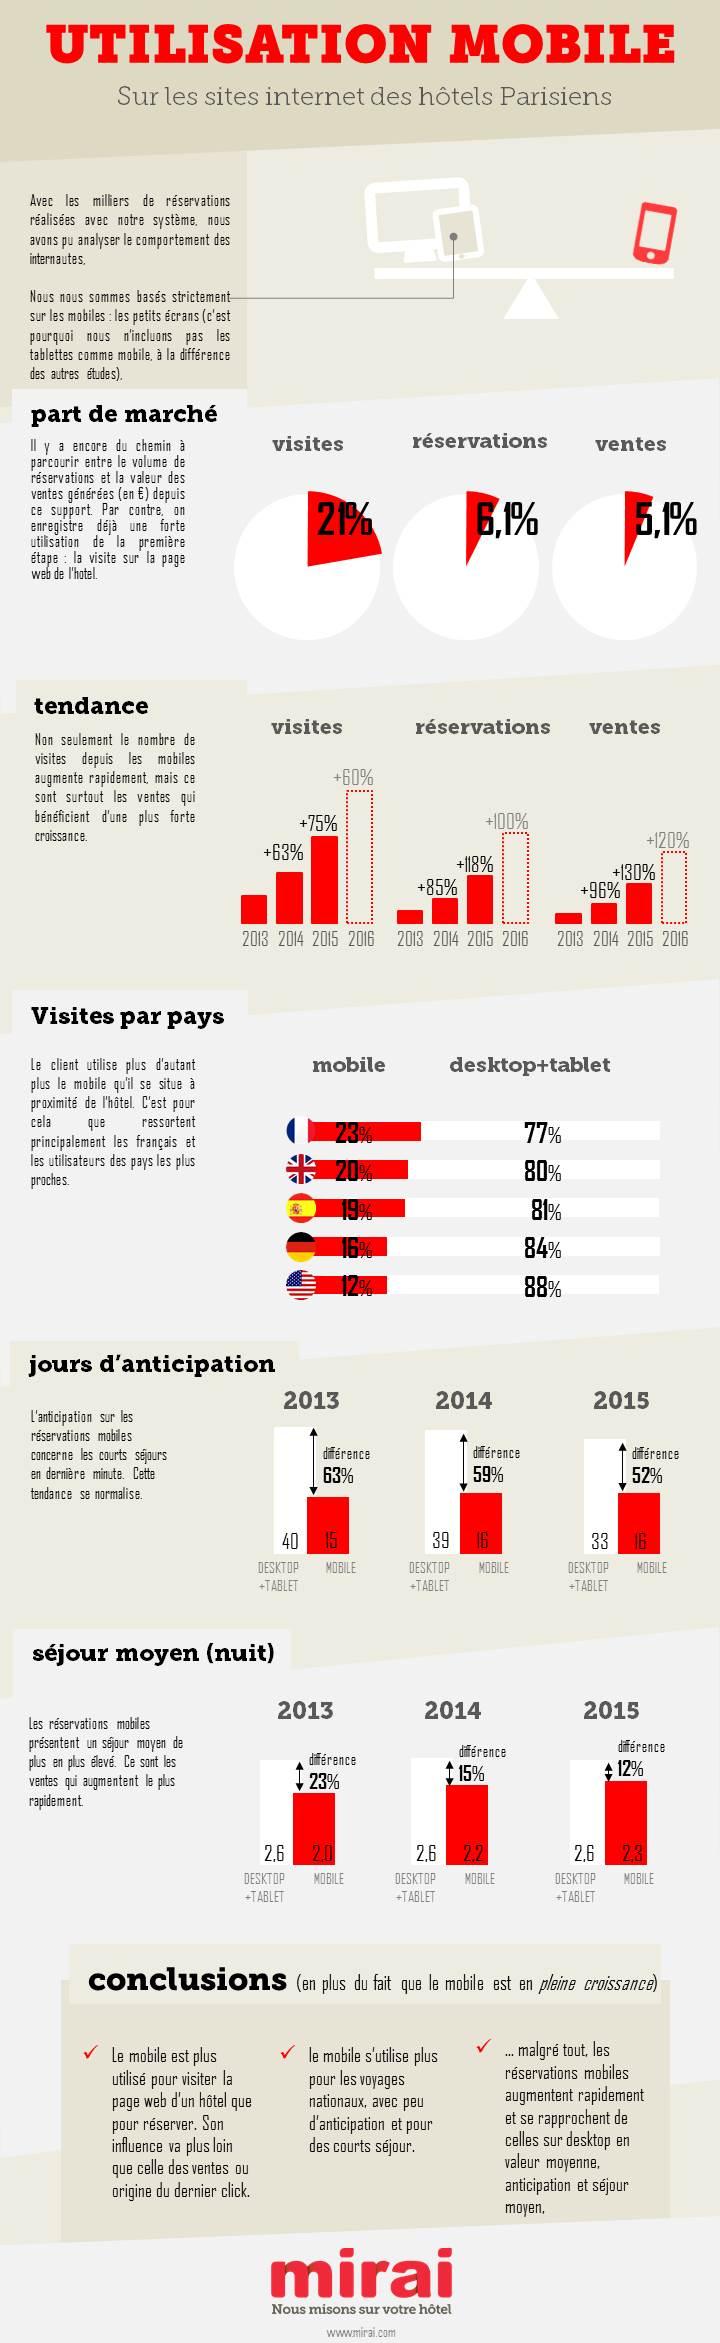 utilisation mobile website hotel paris